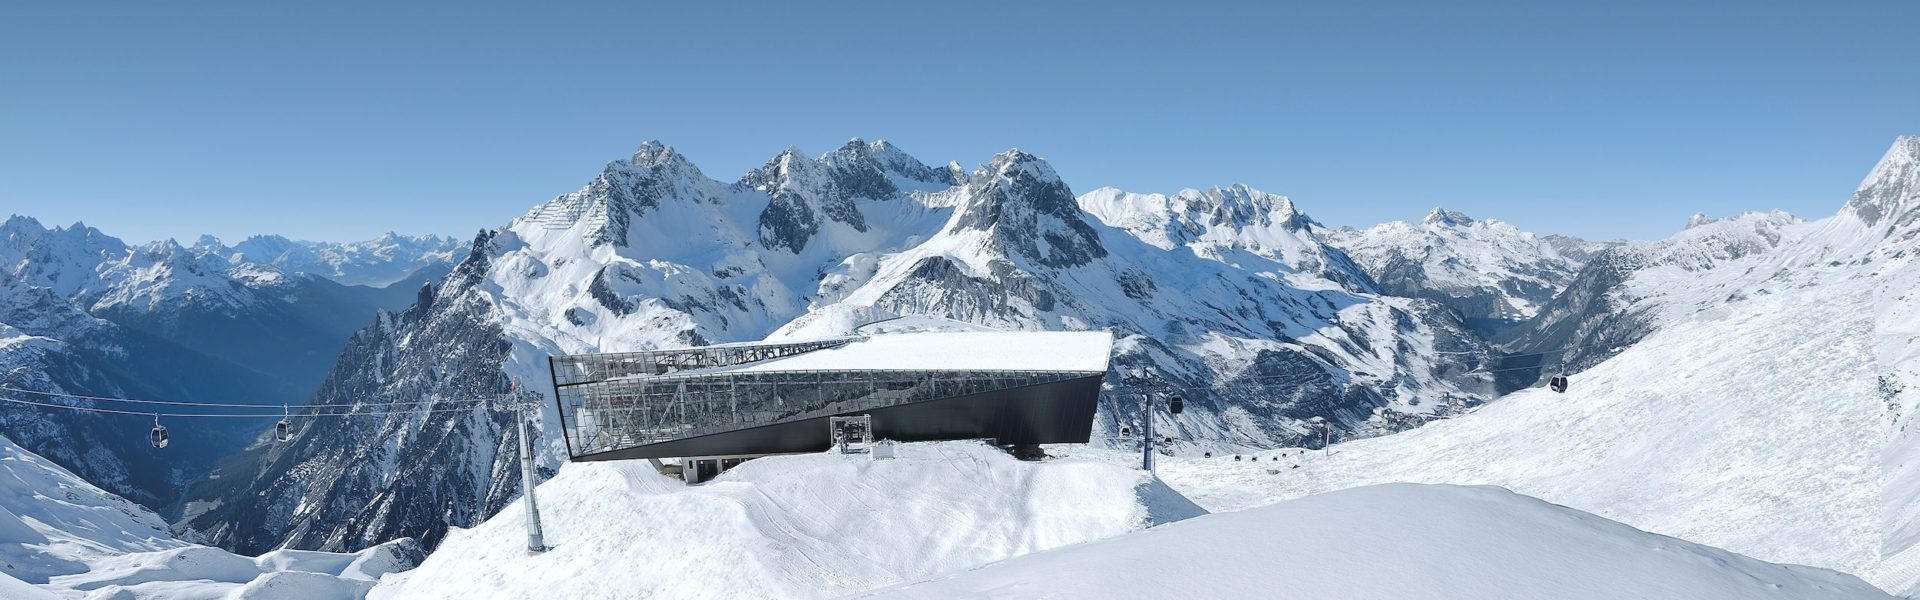 Bergstation Flexenbahn, Lech Zürs, Arlberg (c) Ski Arlberg